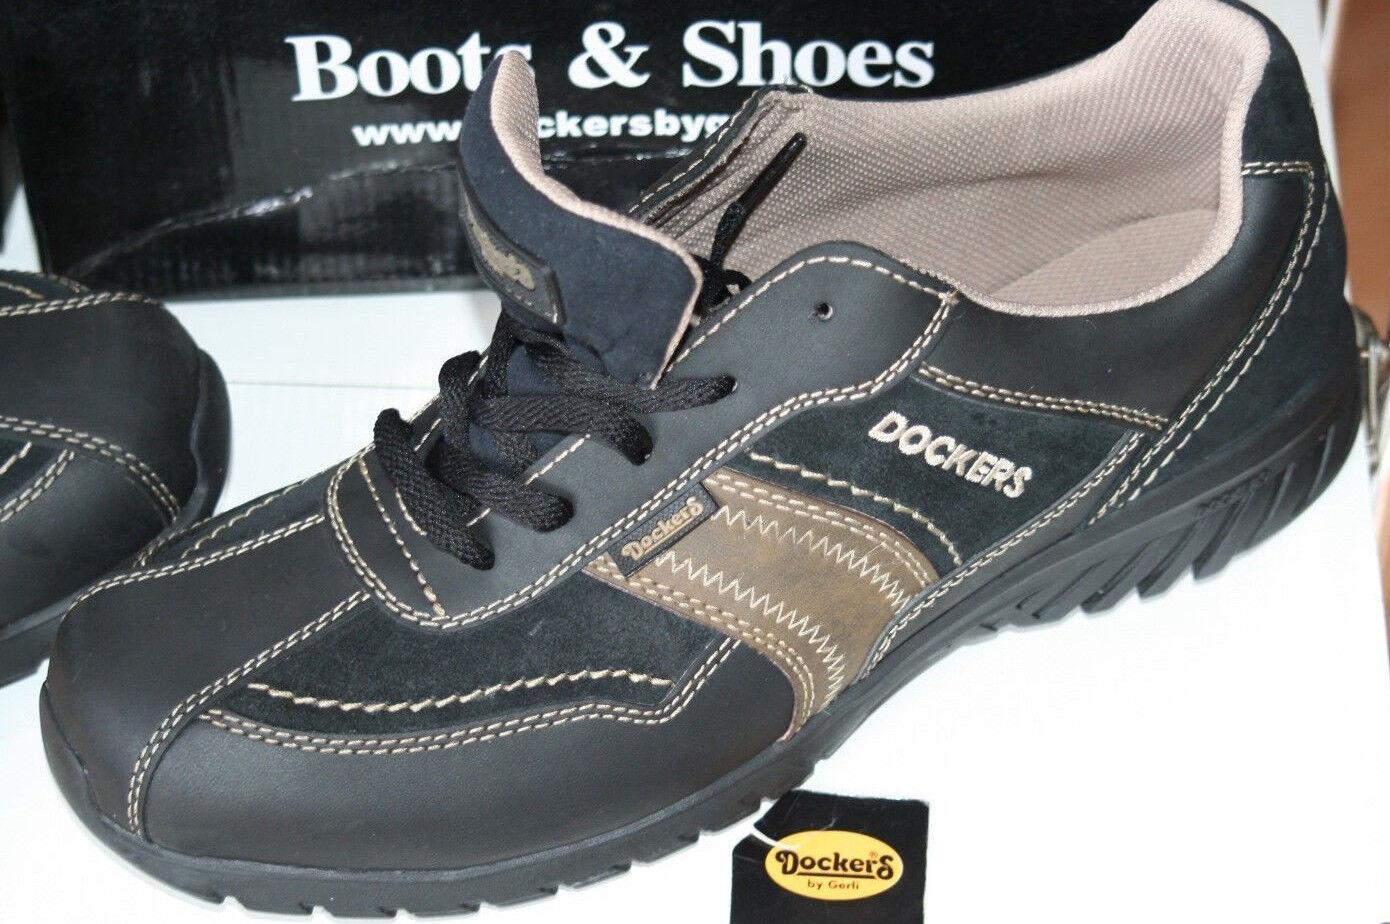 Details zu Vans Schuhe Herren Old Skool Ground Breakers Maroon Leather Vintage Echt Leder